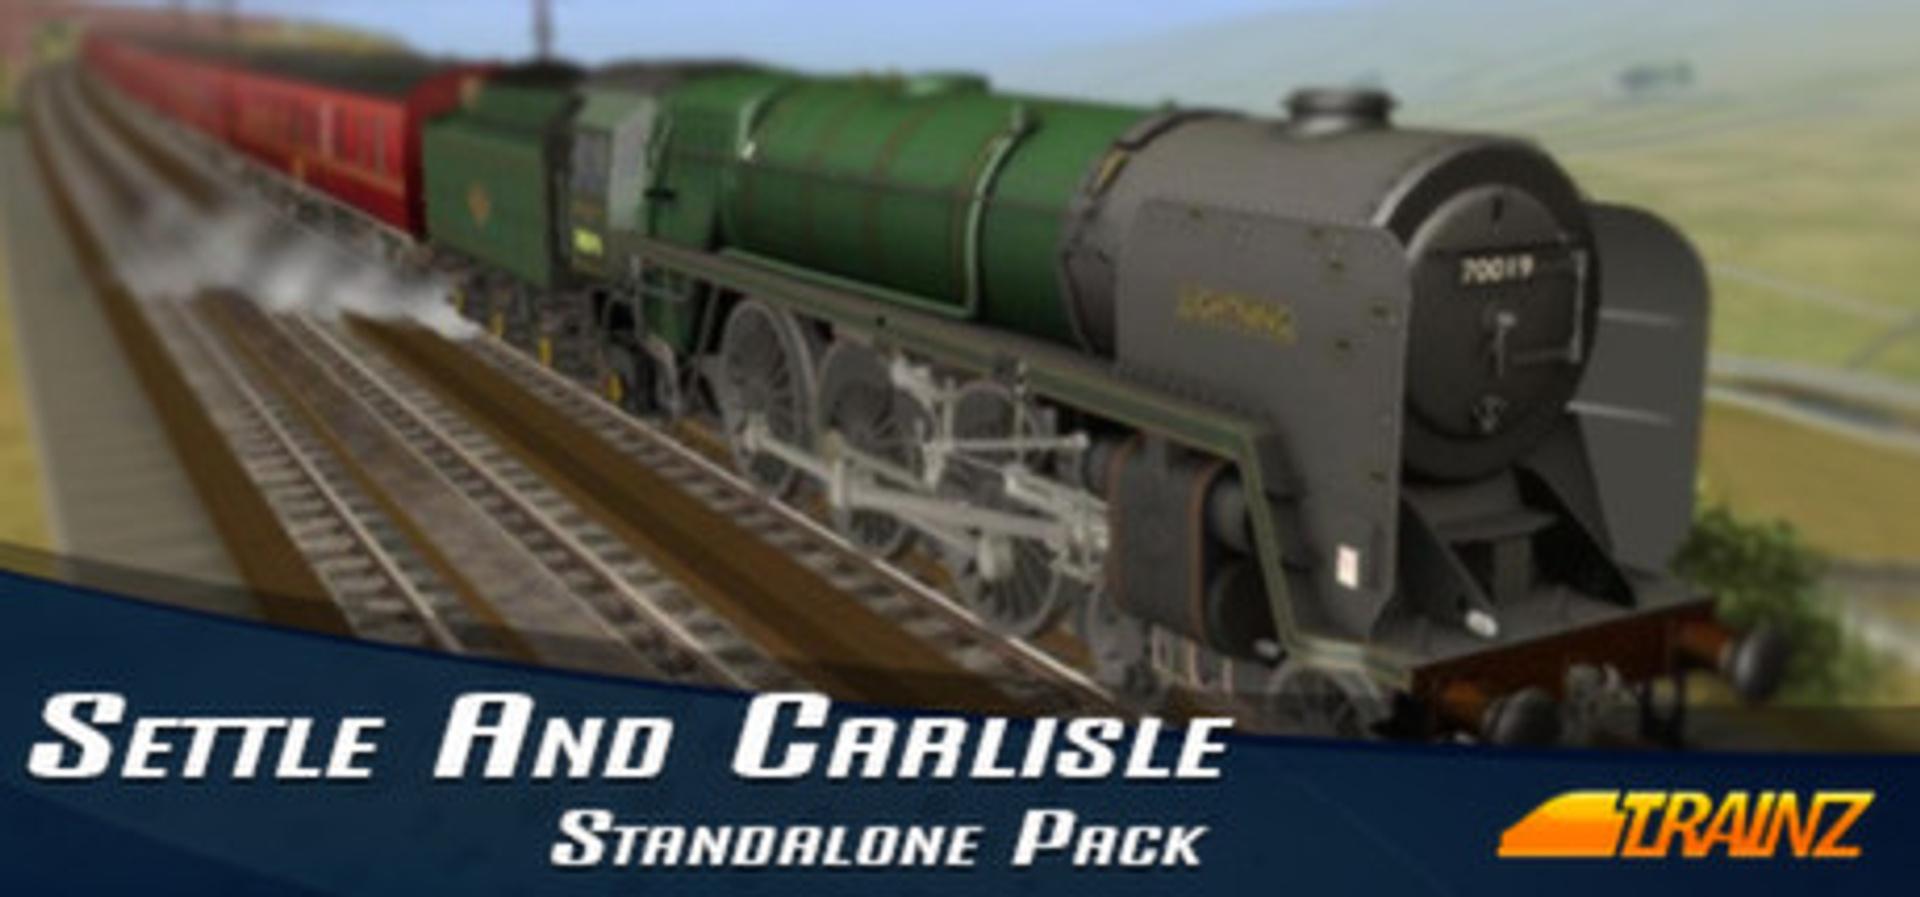 buy Trainz Simulator: Settle & Carlisle cd key for all platform